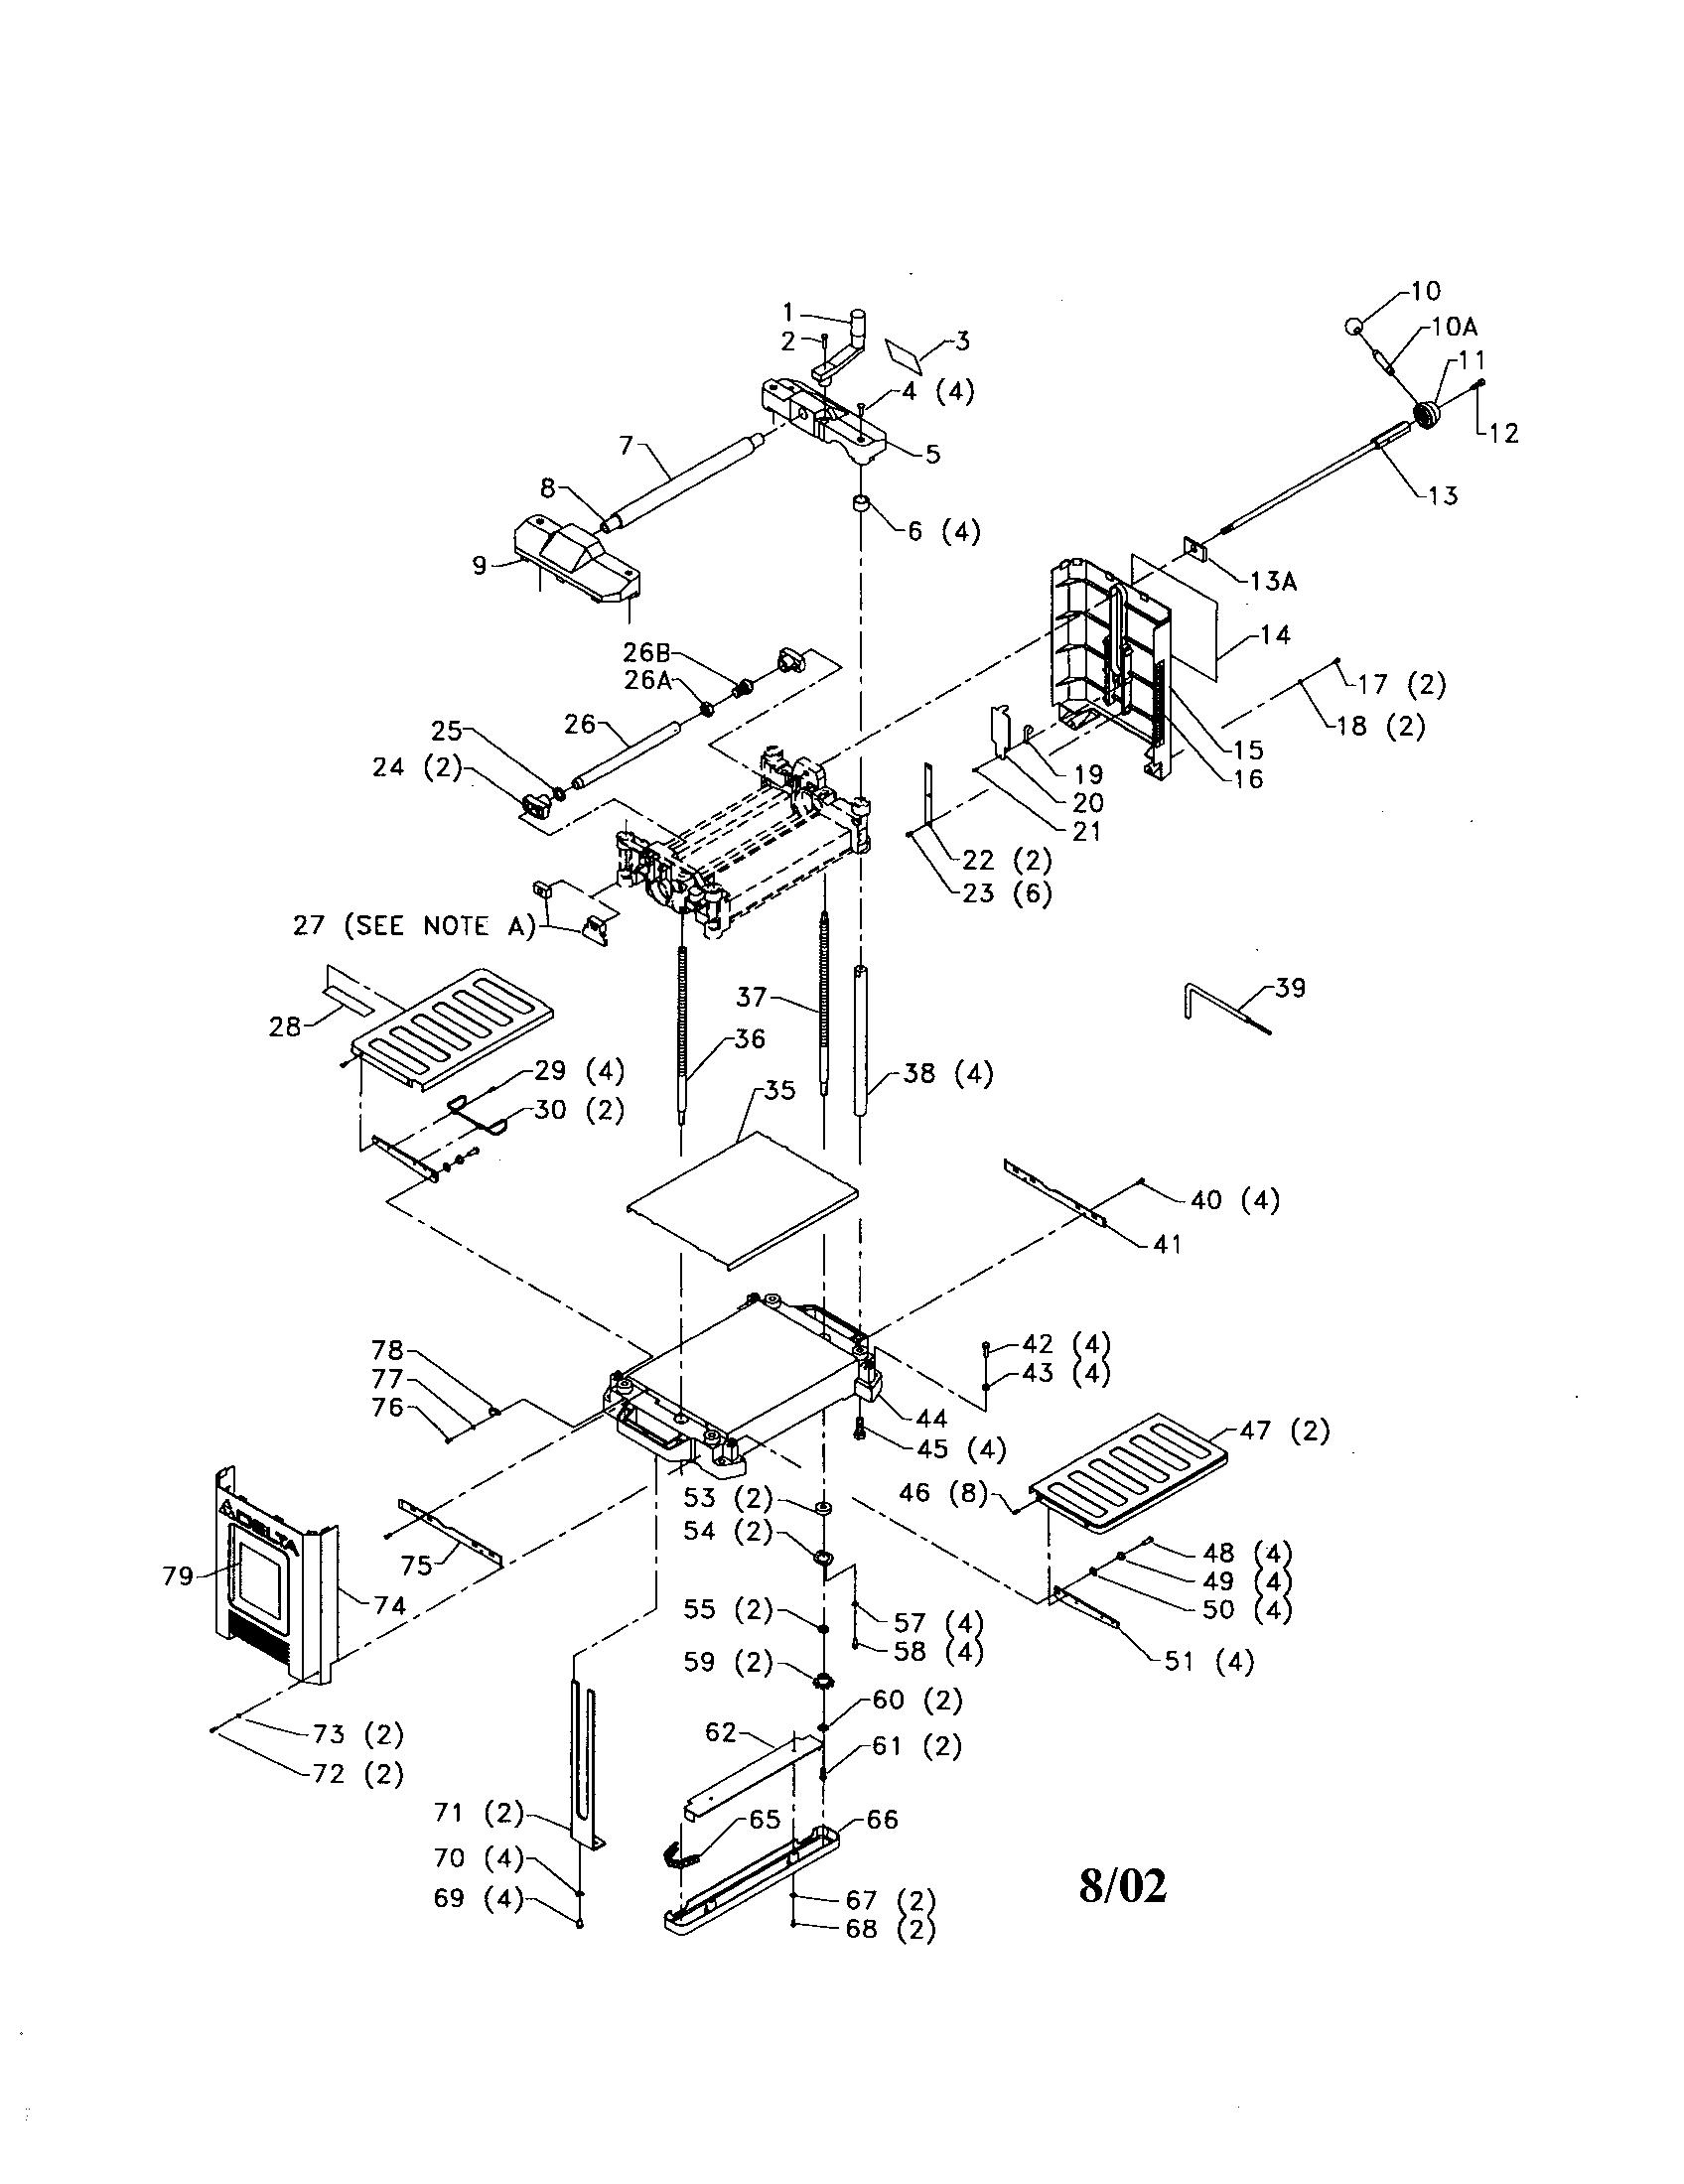 Delta model 22-560 planer genuine parts